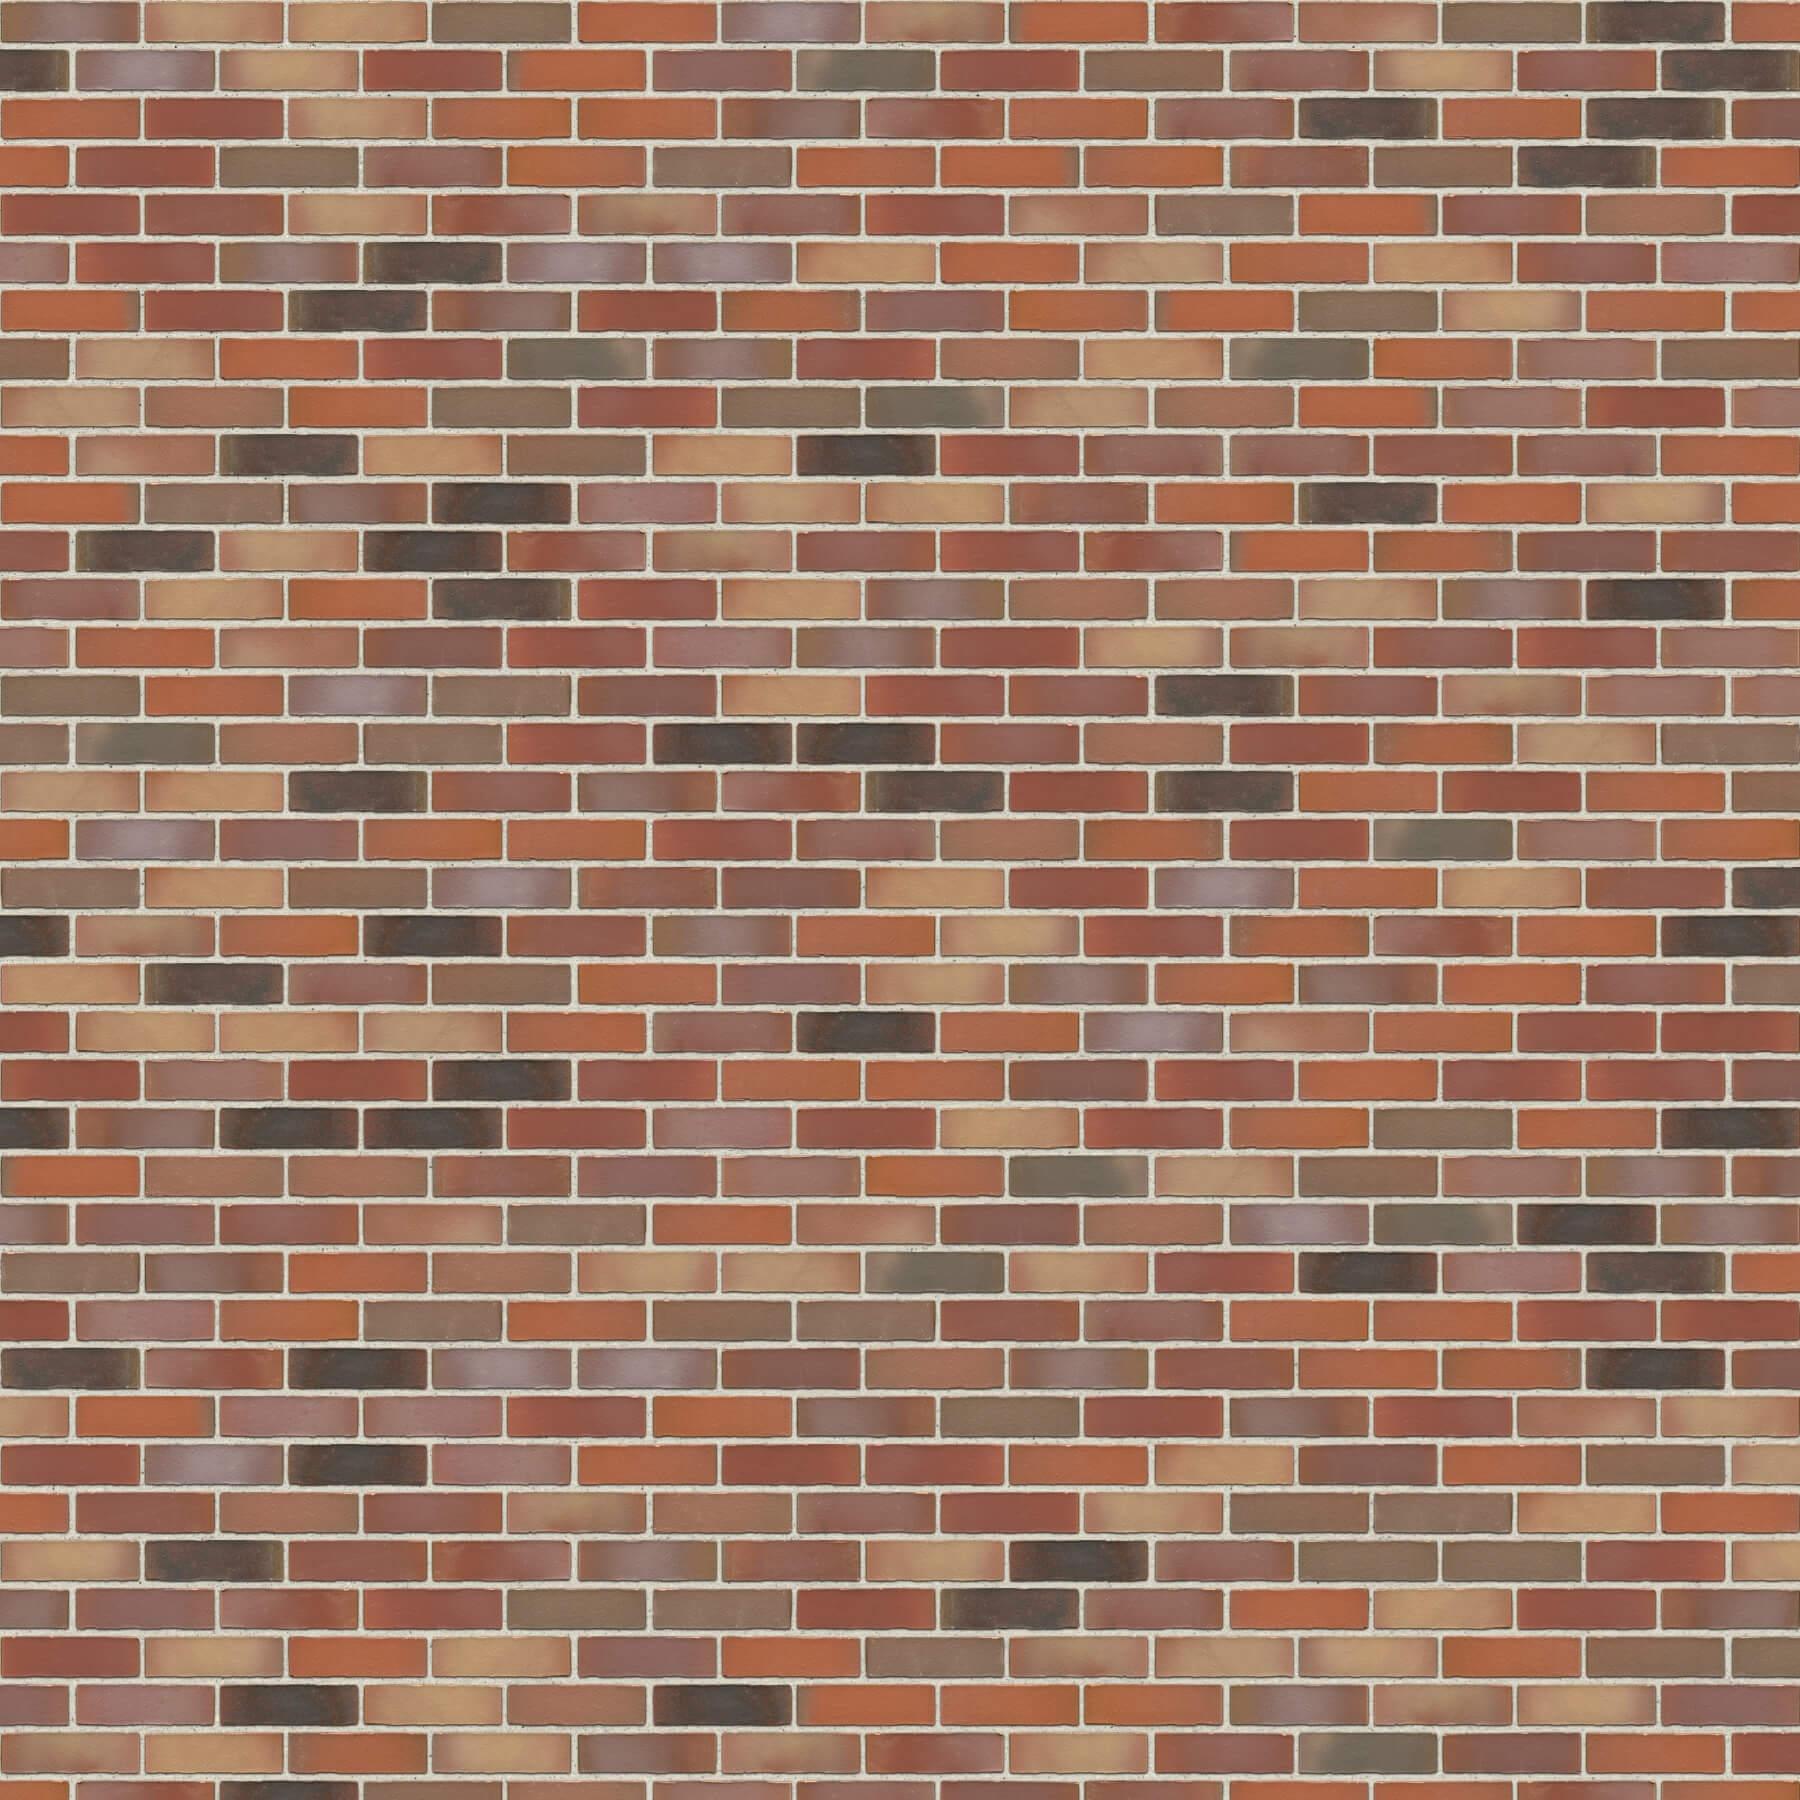 Puna-cigla-FeldHaus-Klinker-brick-house-beograd-nf-k-991-Bela Fuga